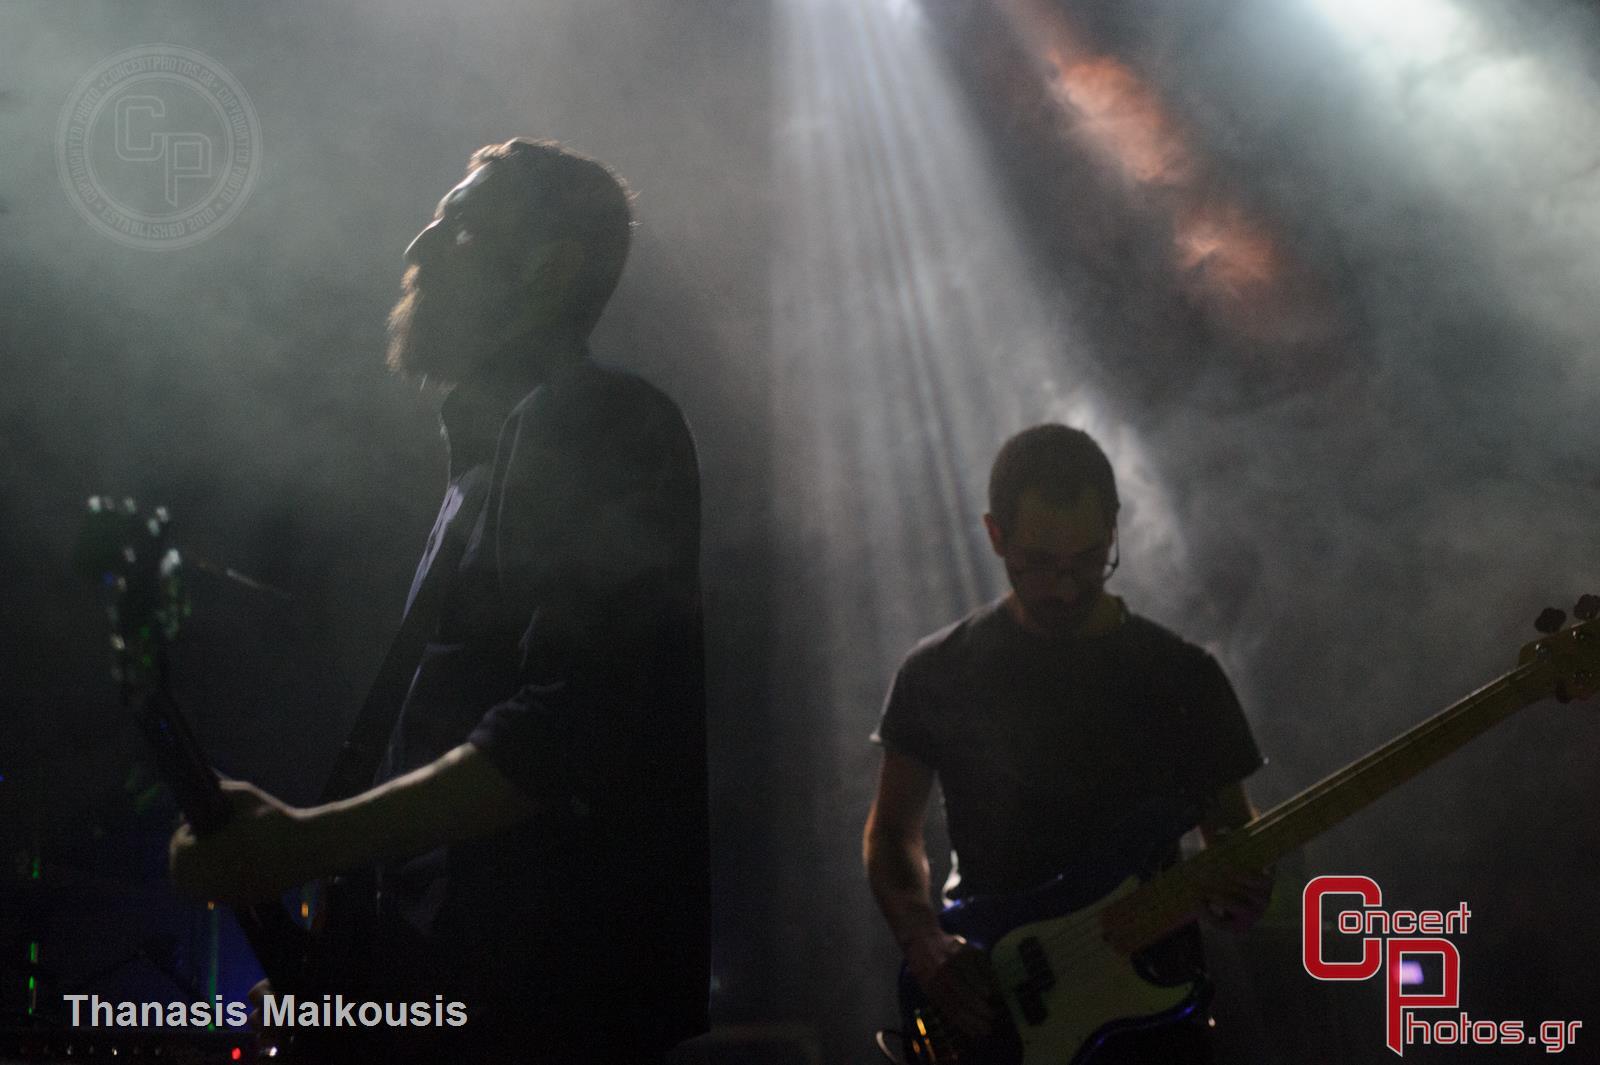 Electric Litany -  GravitySays-Electric Litany GravitySays photographer: Thanasis Maikousis - concertphotos_20150418_21_11_21